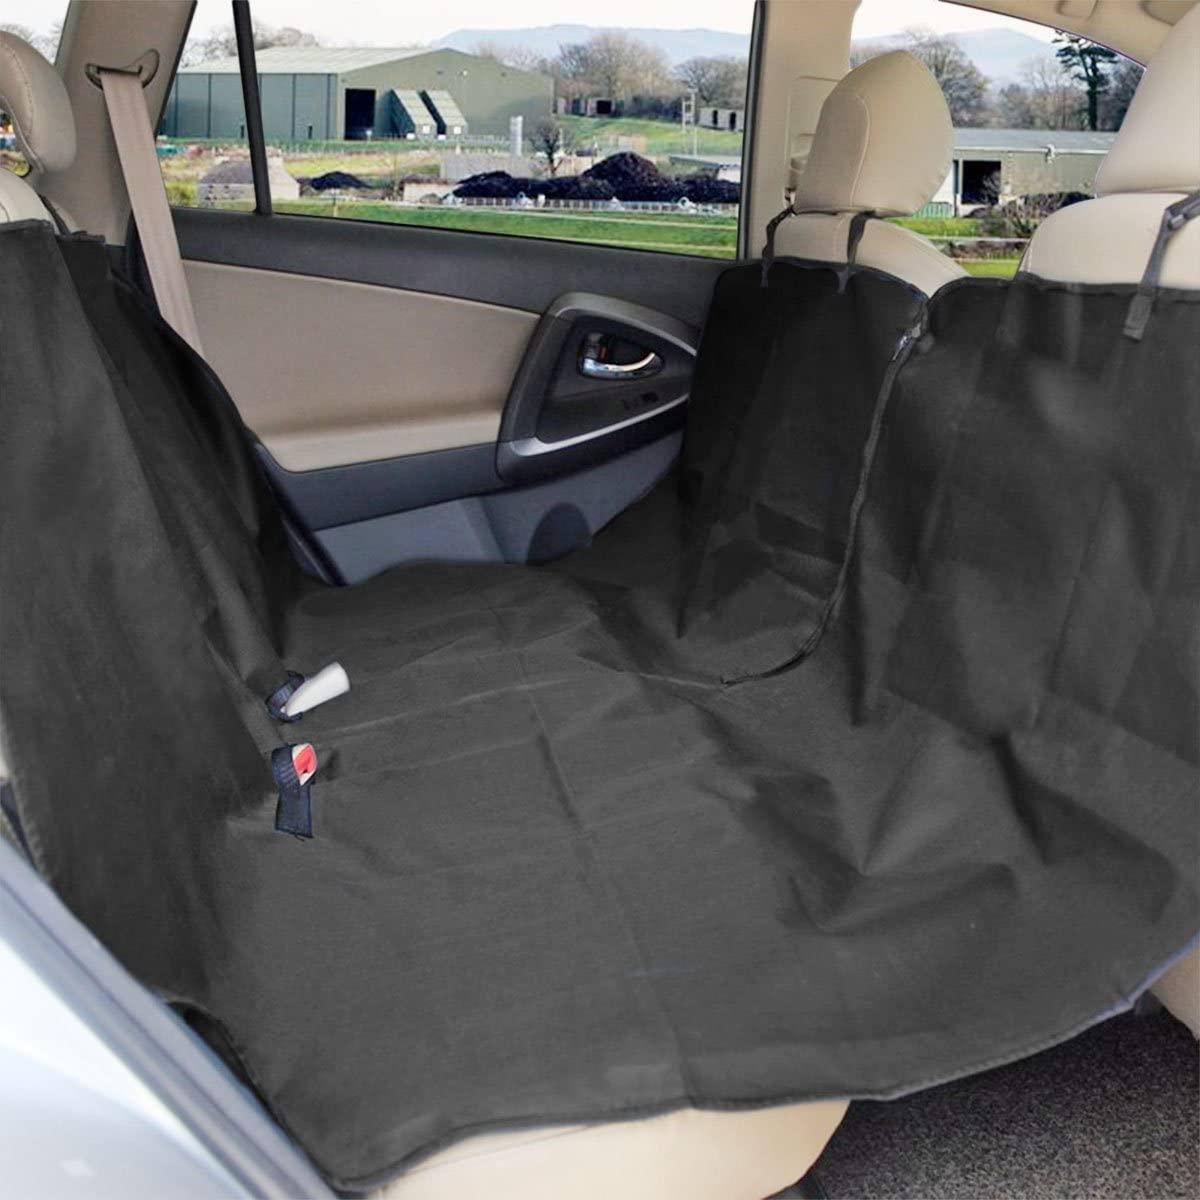 Zone Tech Car Pet Hammock - Black Premium Quality Heavy Duty Dog Pet Vehicle Seat Protector